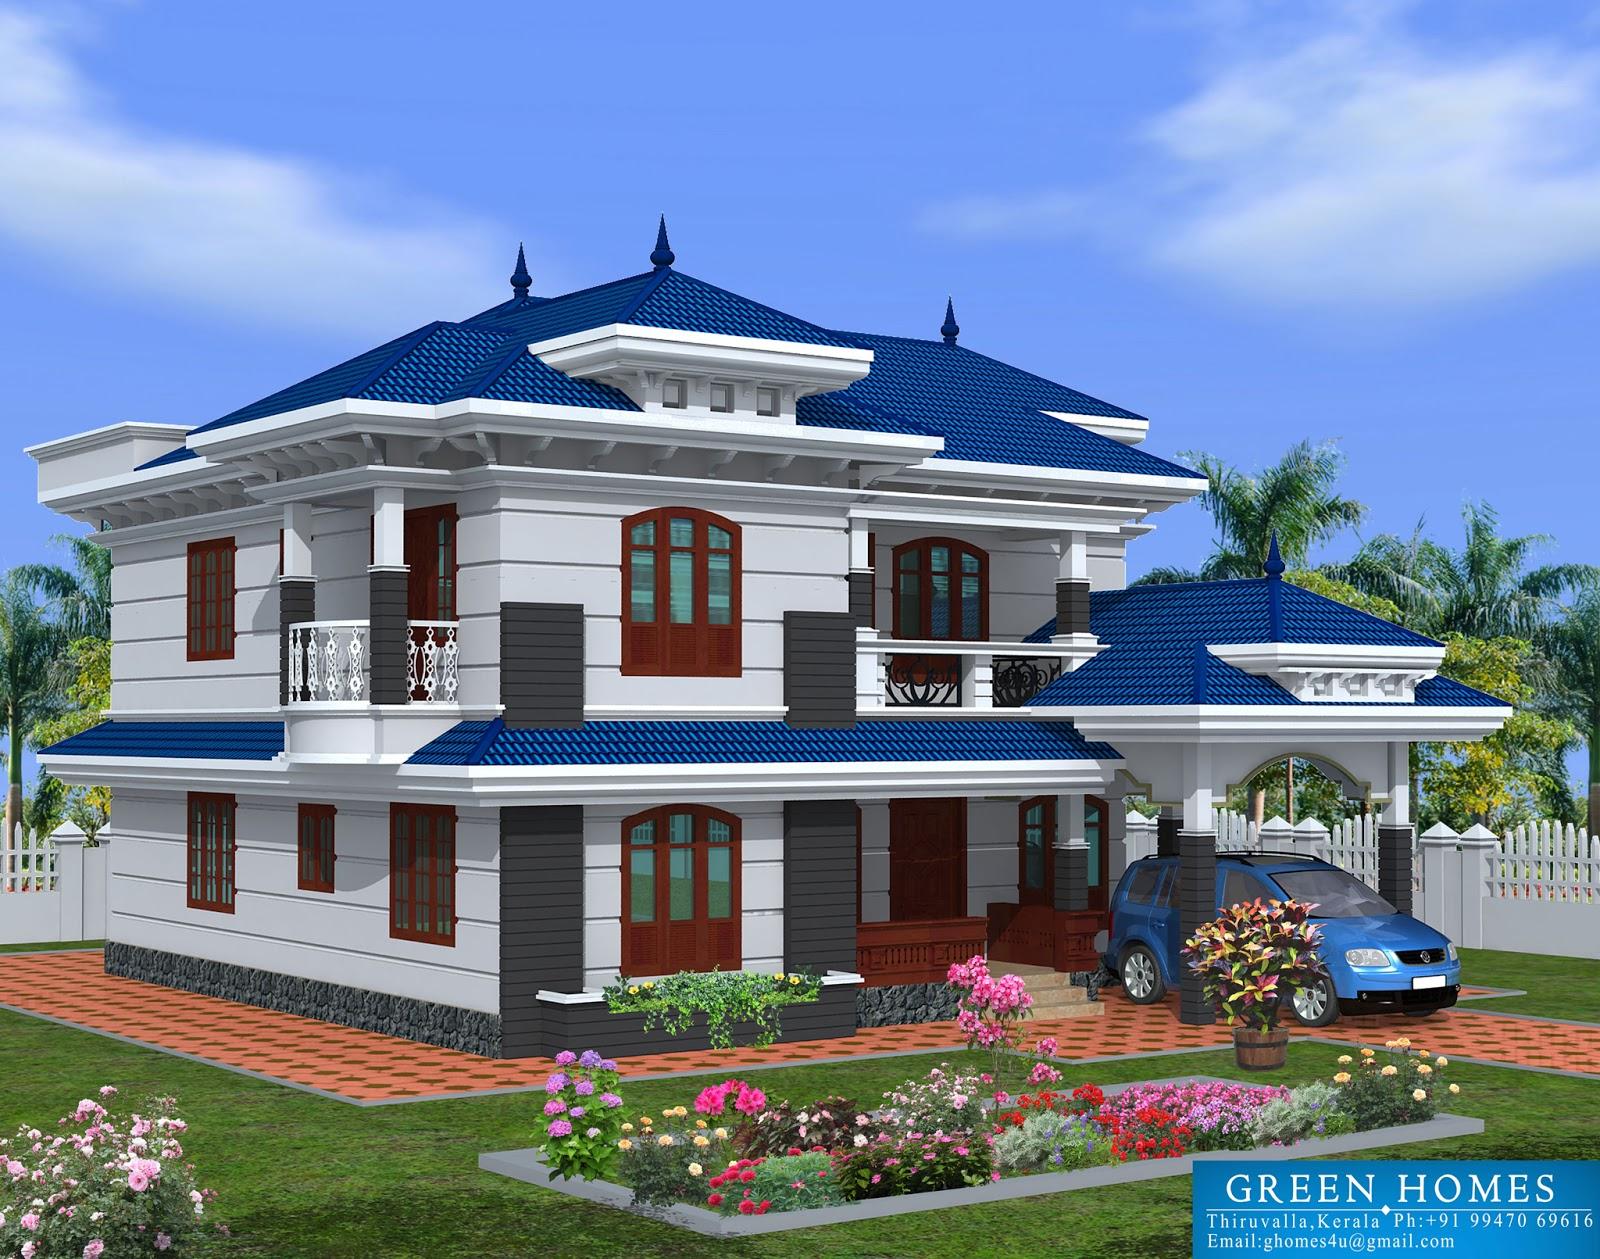 elko nv home design trendsbraemar construction top home design